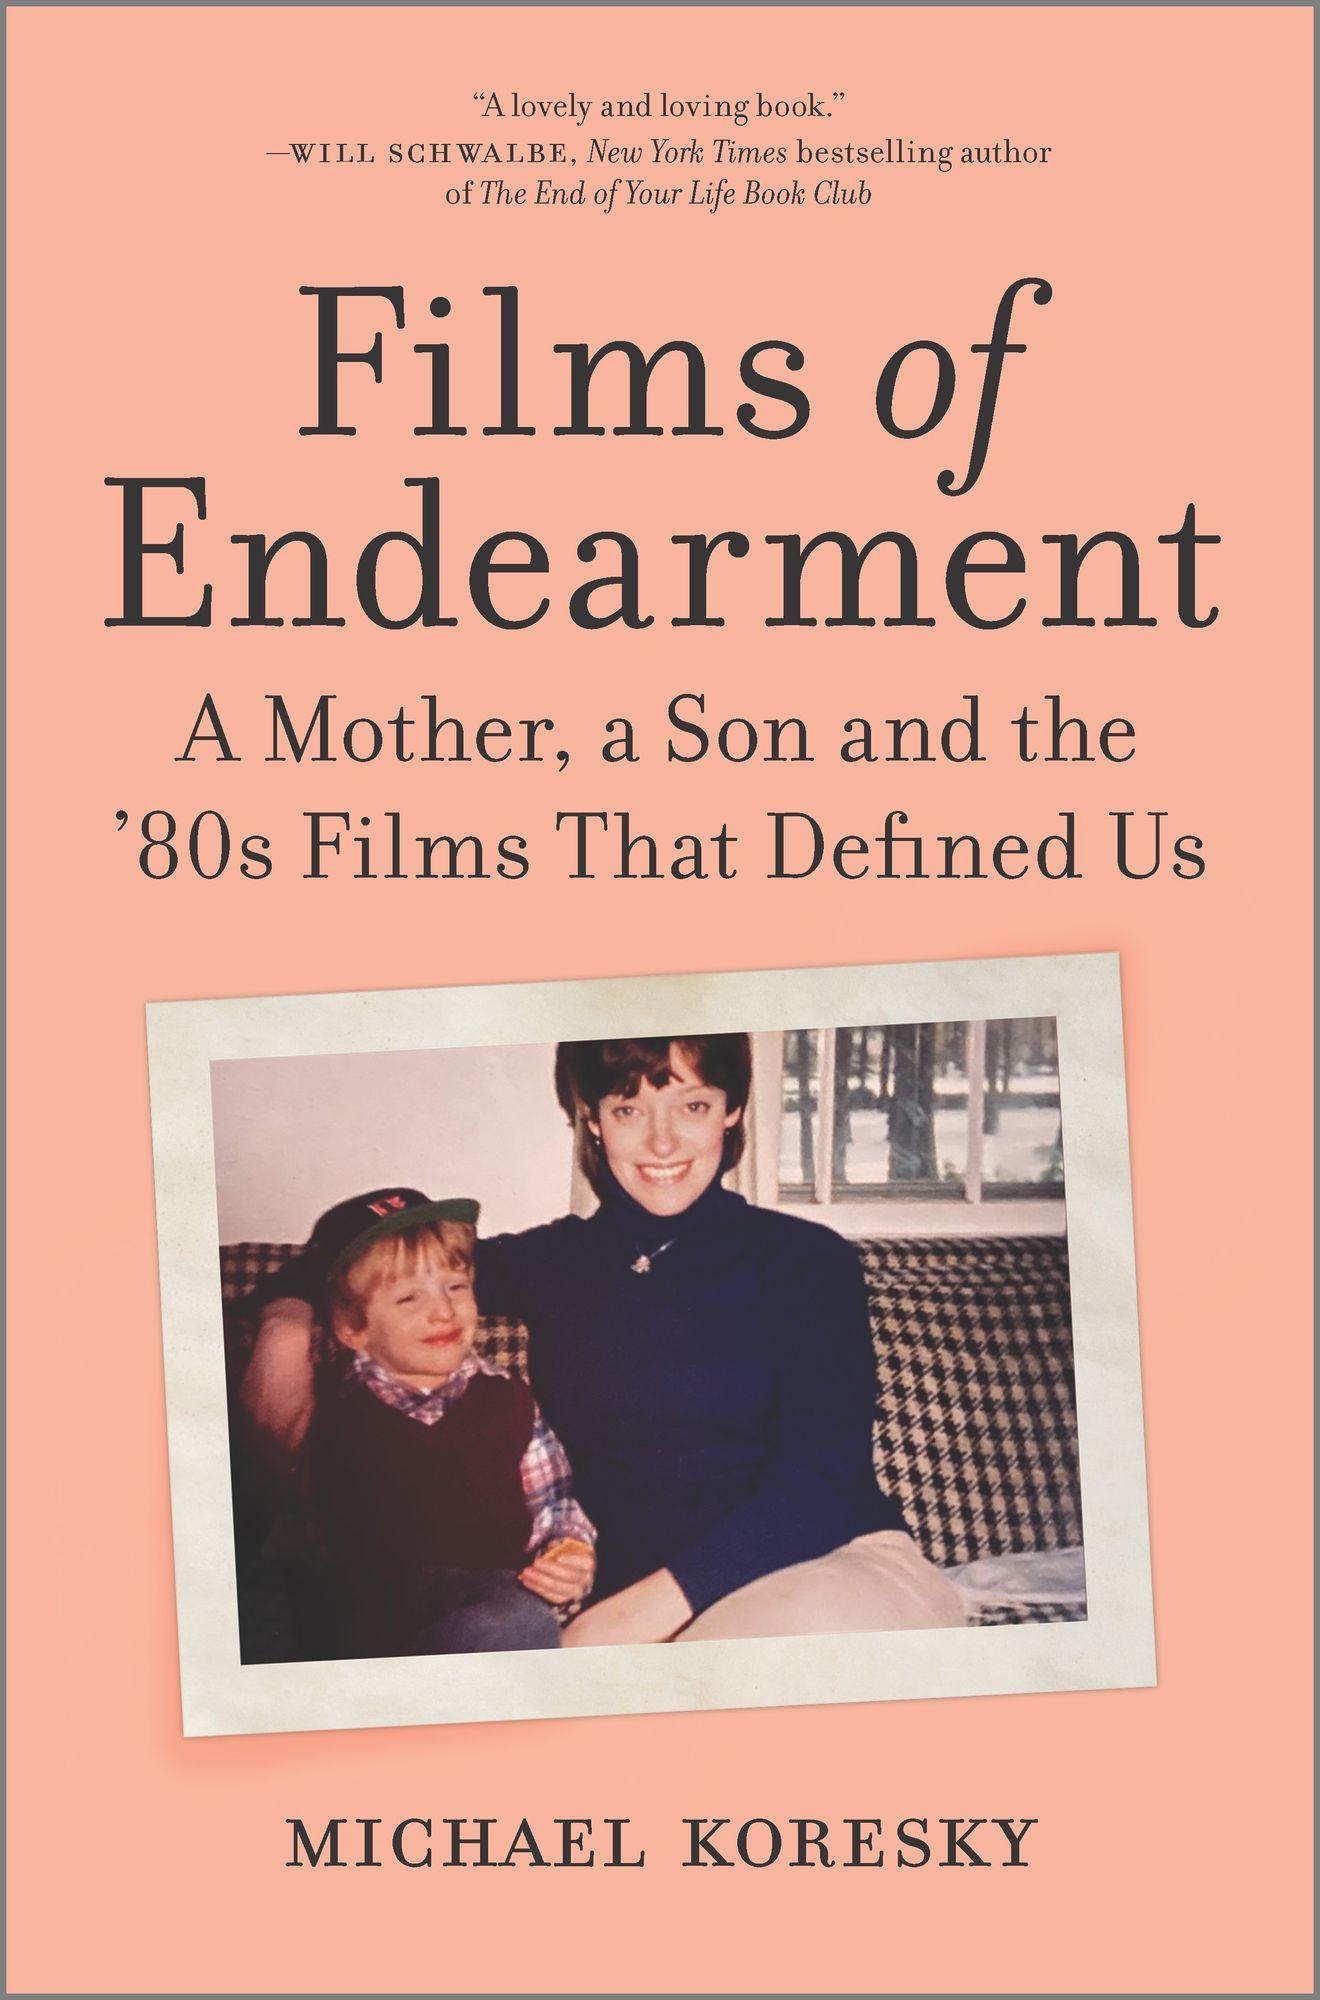 Films of Endearment by Michael Koresky